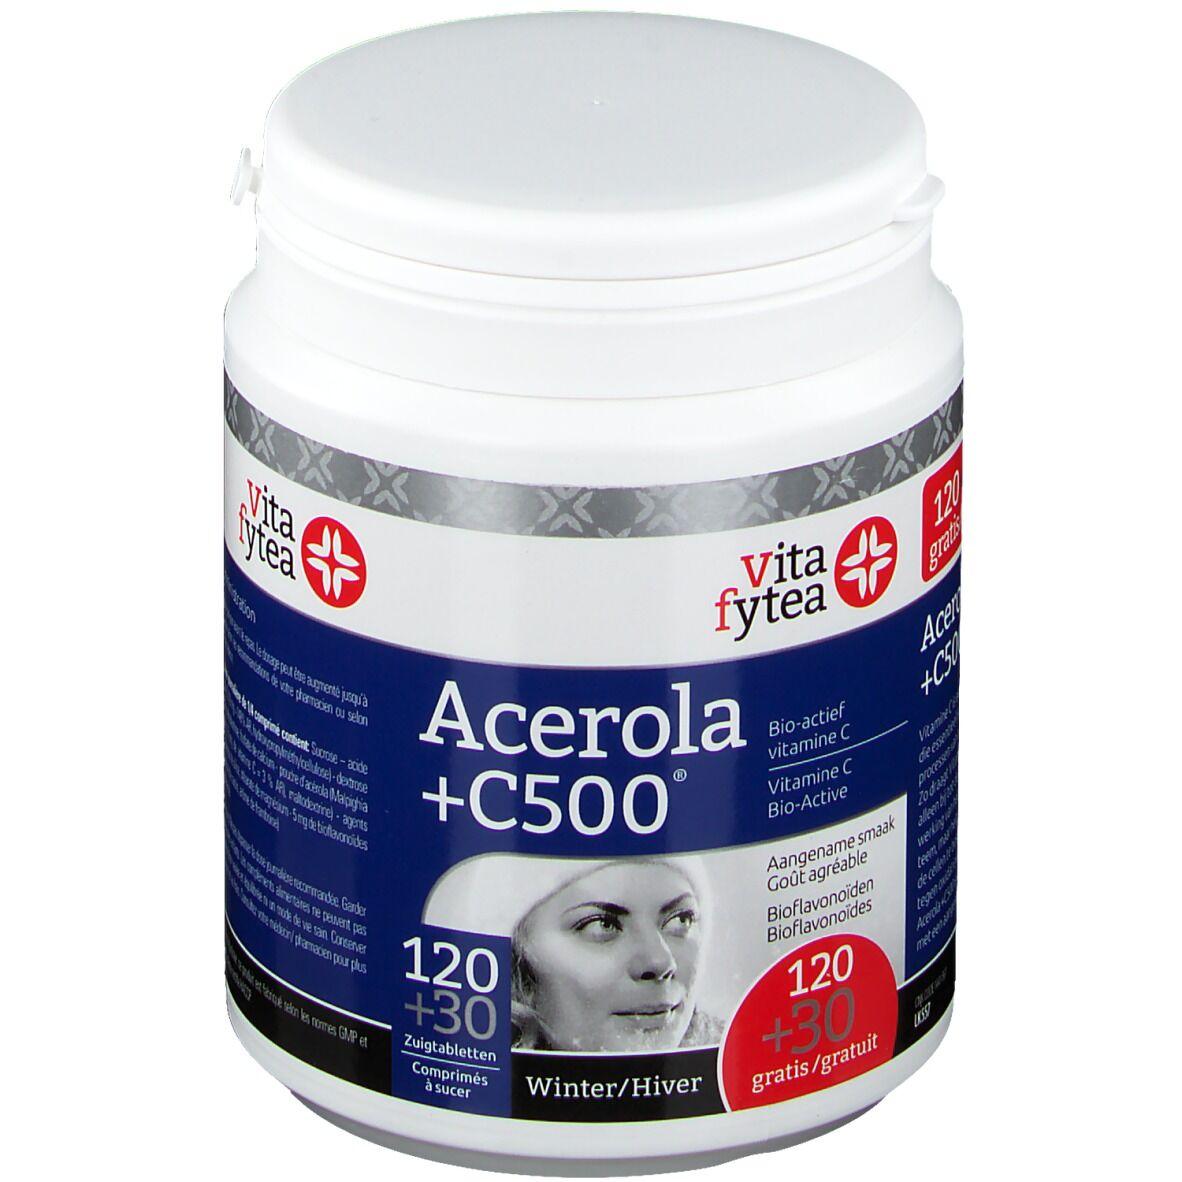 TeamEtixx Vitafytea Acerola +C500 pc(s) comprimé(s) à sucer